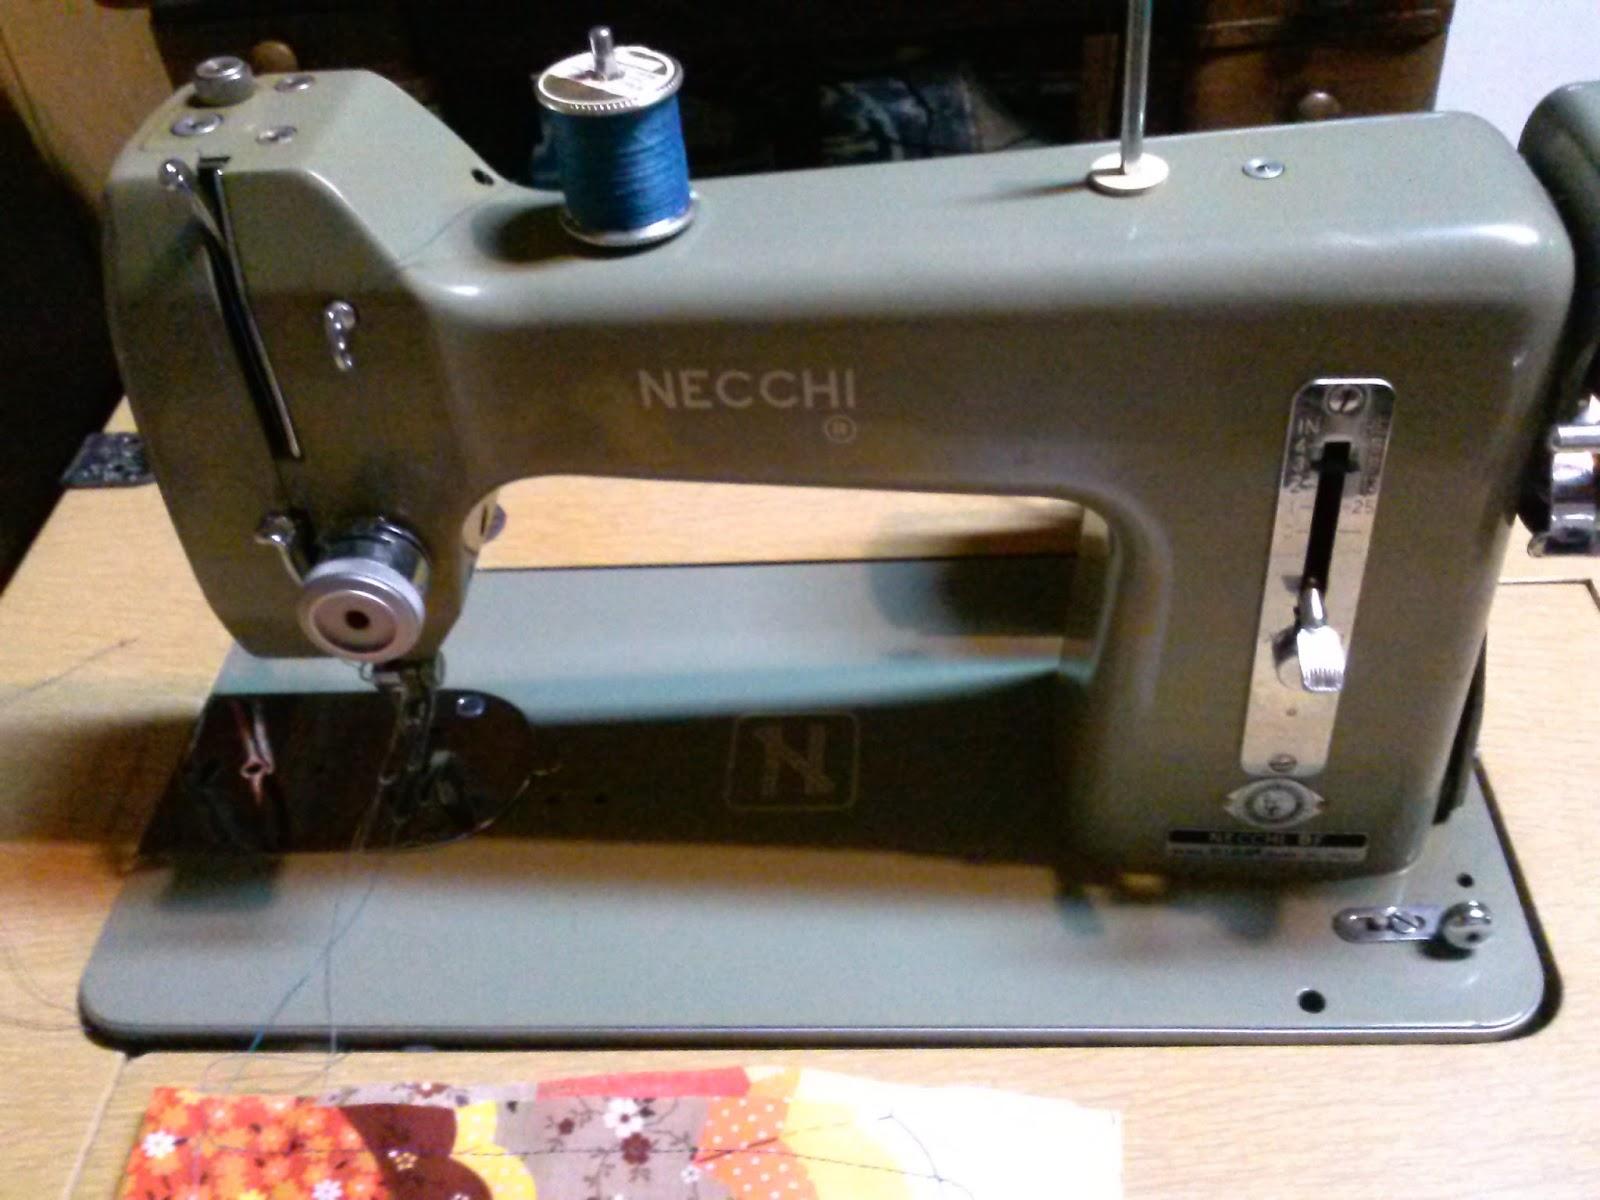 Necchi bf Mira instruction manual on necchi bu mira belt, necchi bu mira ebay, necchi bu mira sewing machine,